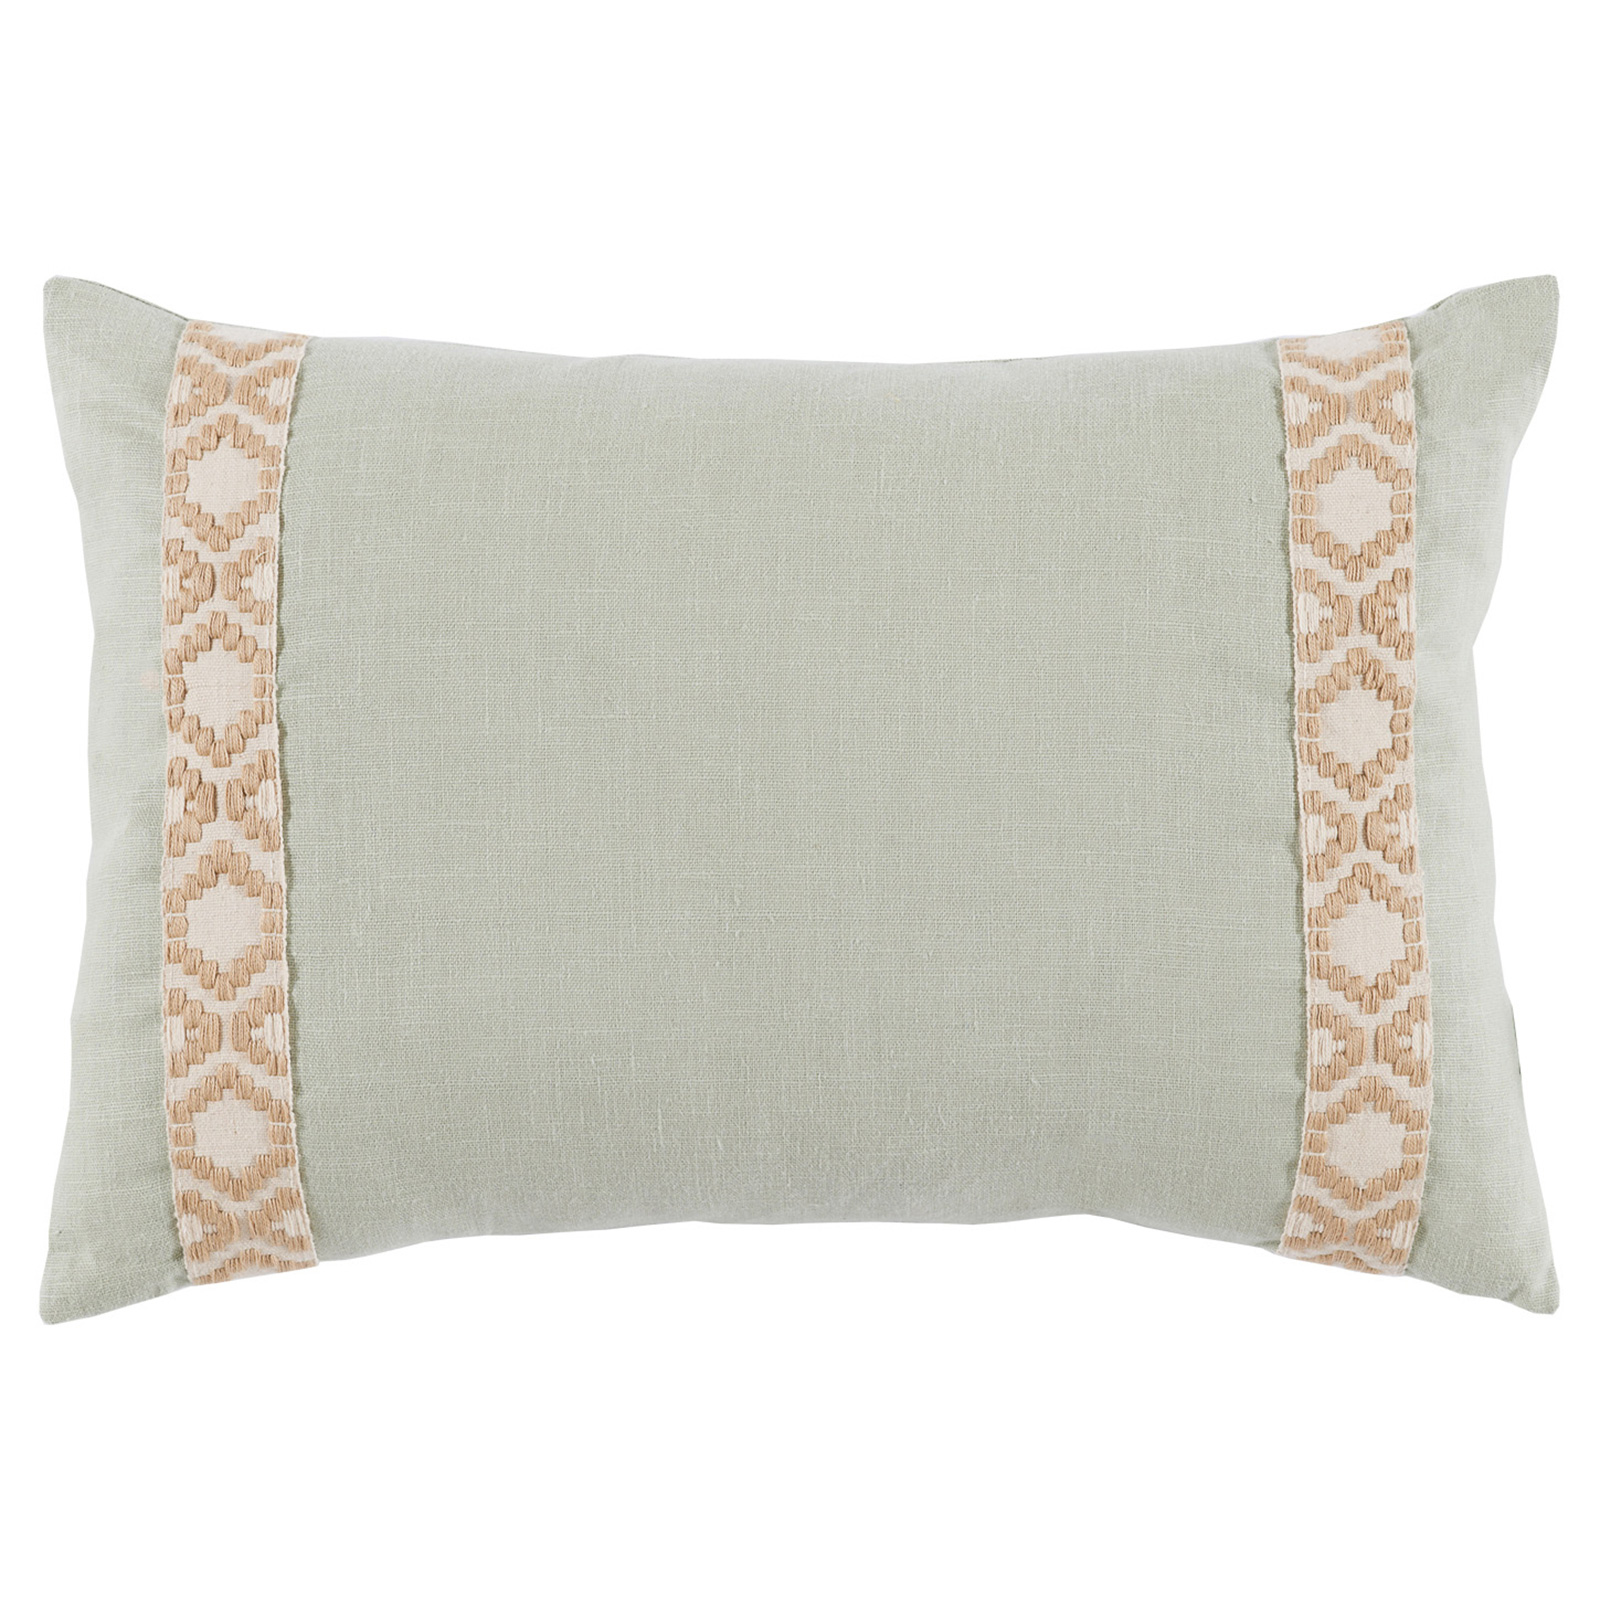 Kaia Global Sea Green Linen Trim Band Pillow - 13x19